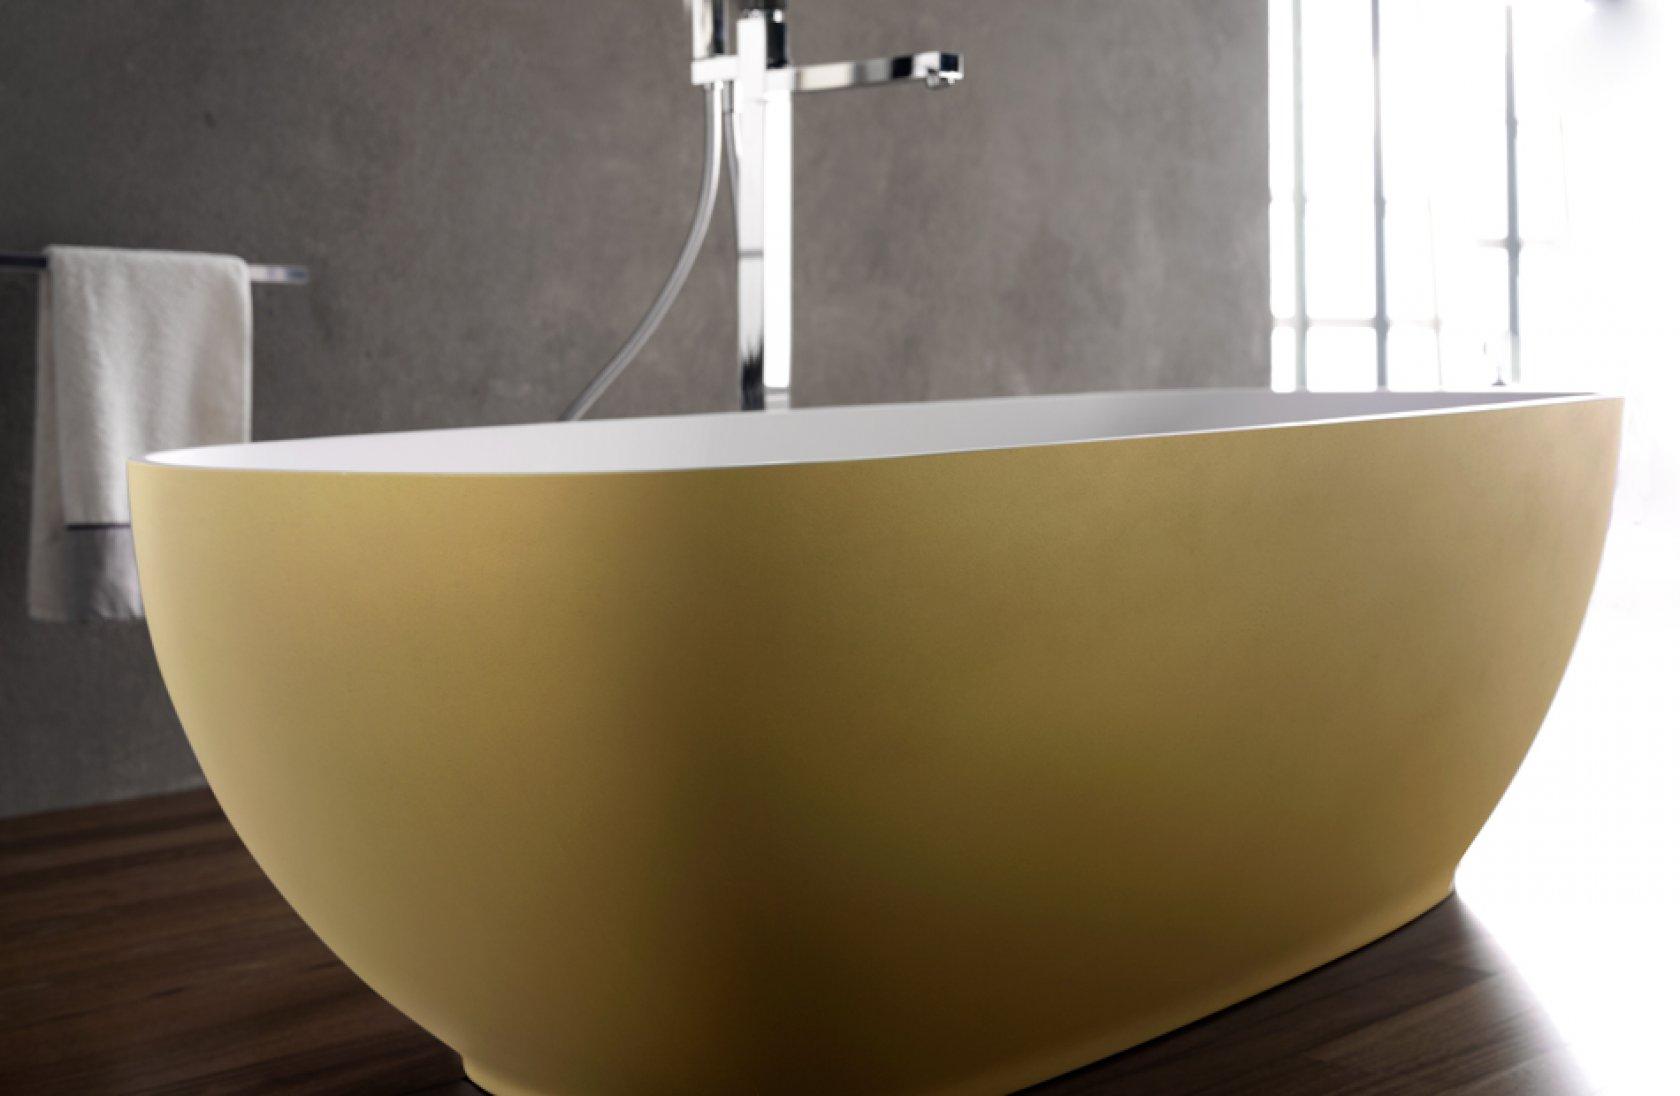 Guscio Vasca Da Bagno Prezzi : Blubleu vasche da bagno vasche da bagno edilceramiche di maccanò